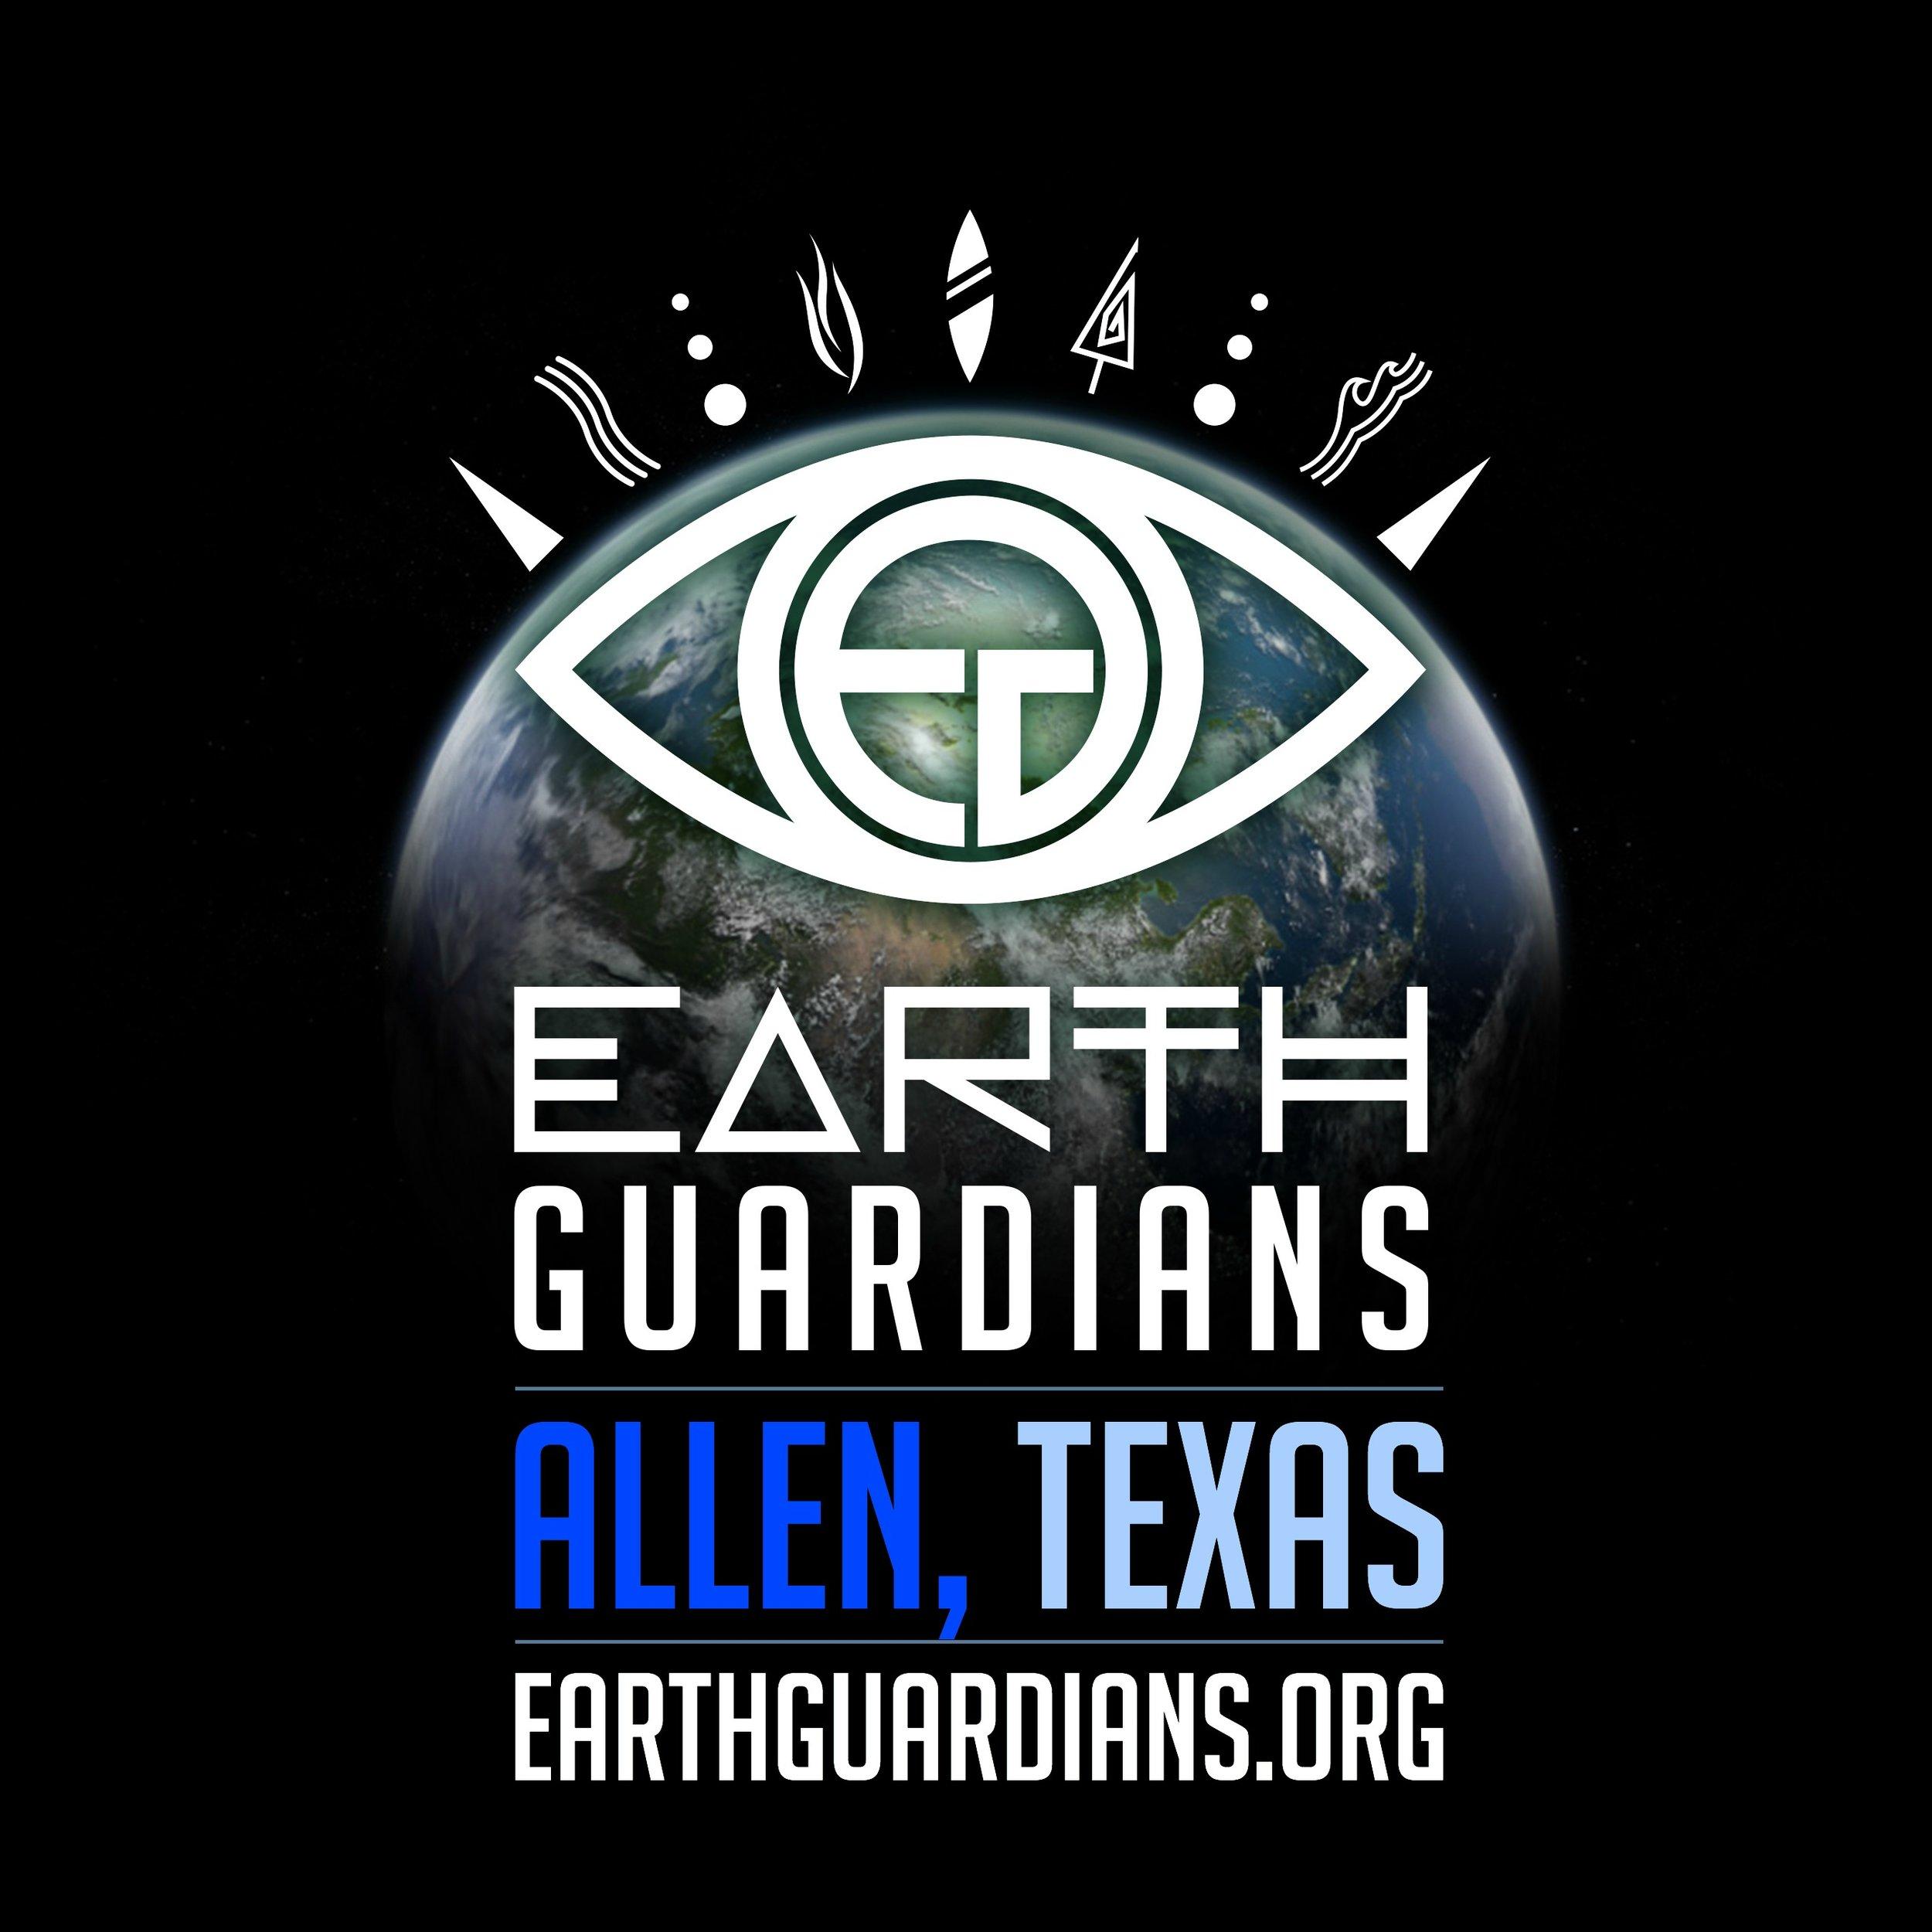 EG_crew logo ALLEN TEXAS.jpg